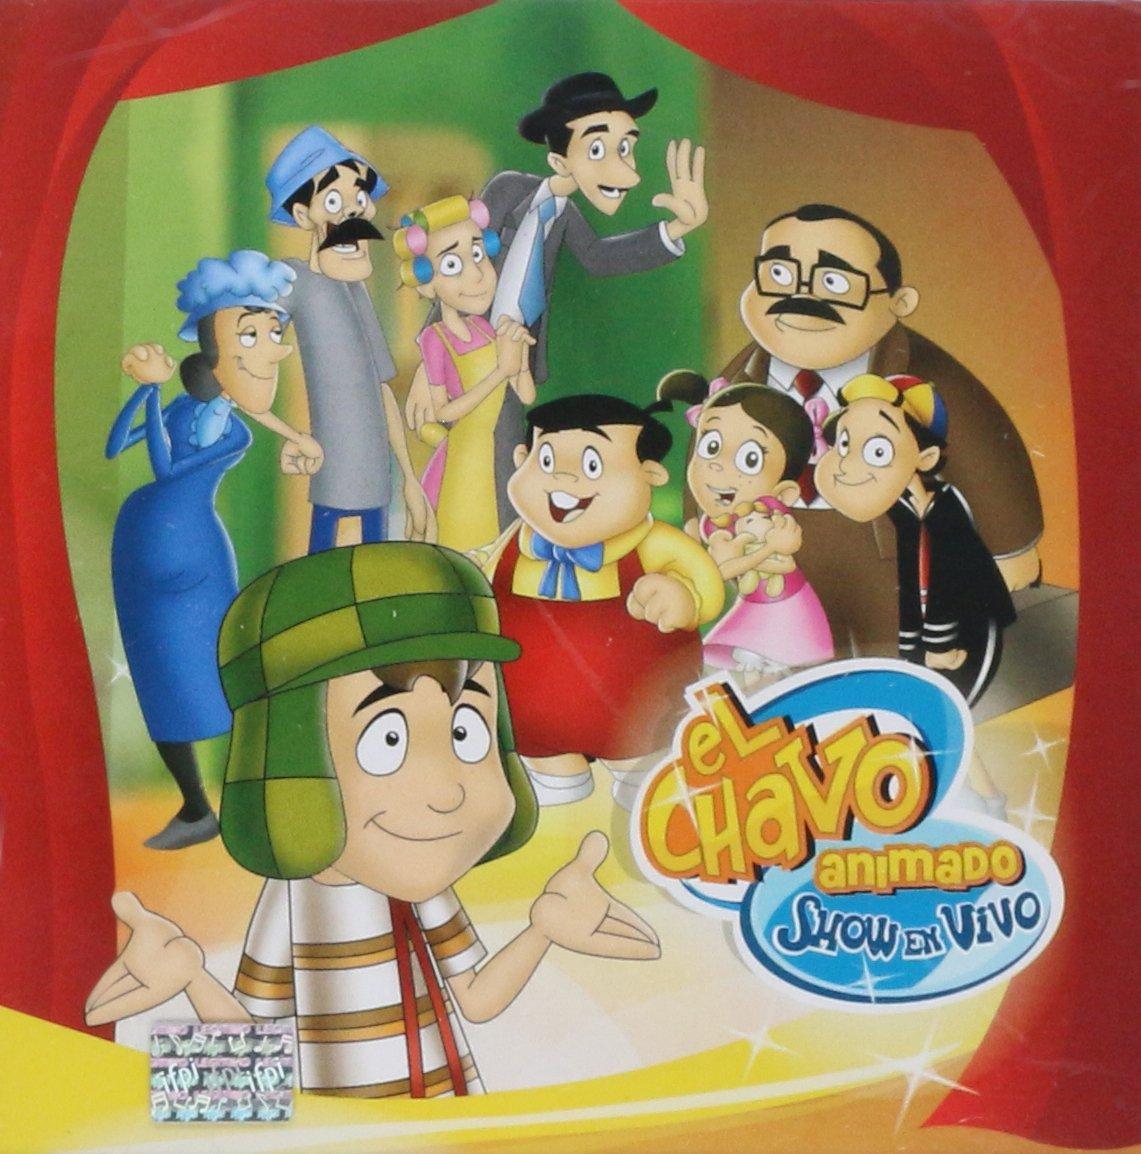 El Chavo Animado, El Chavo Animado - El Chavo Animado Show En Vivo -  Amazon.com Music